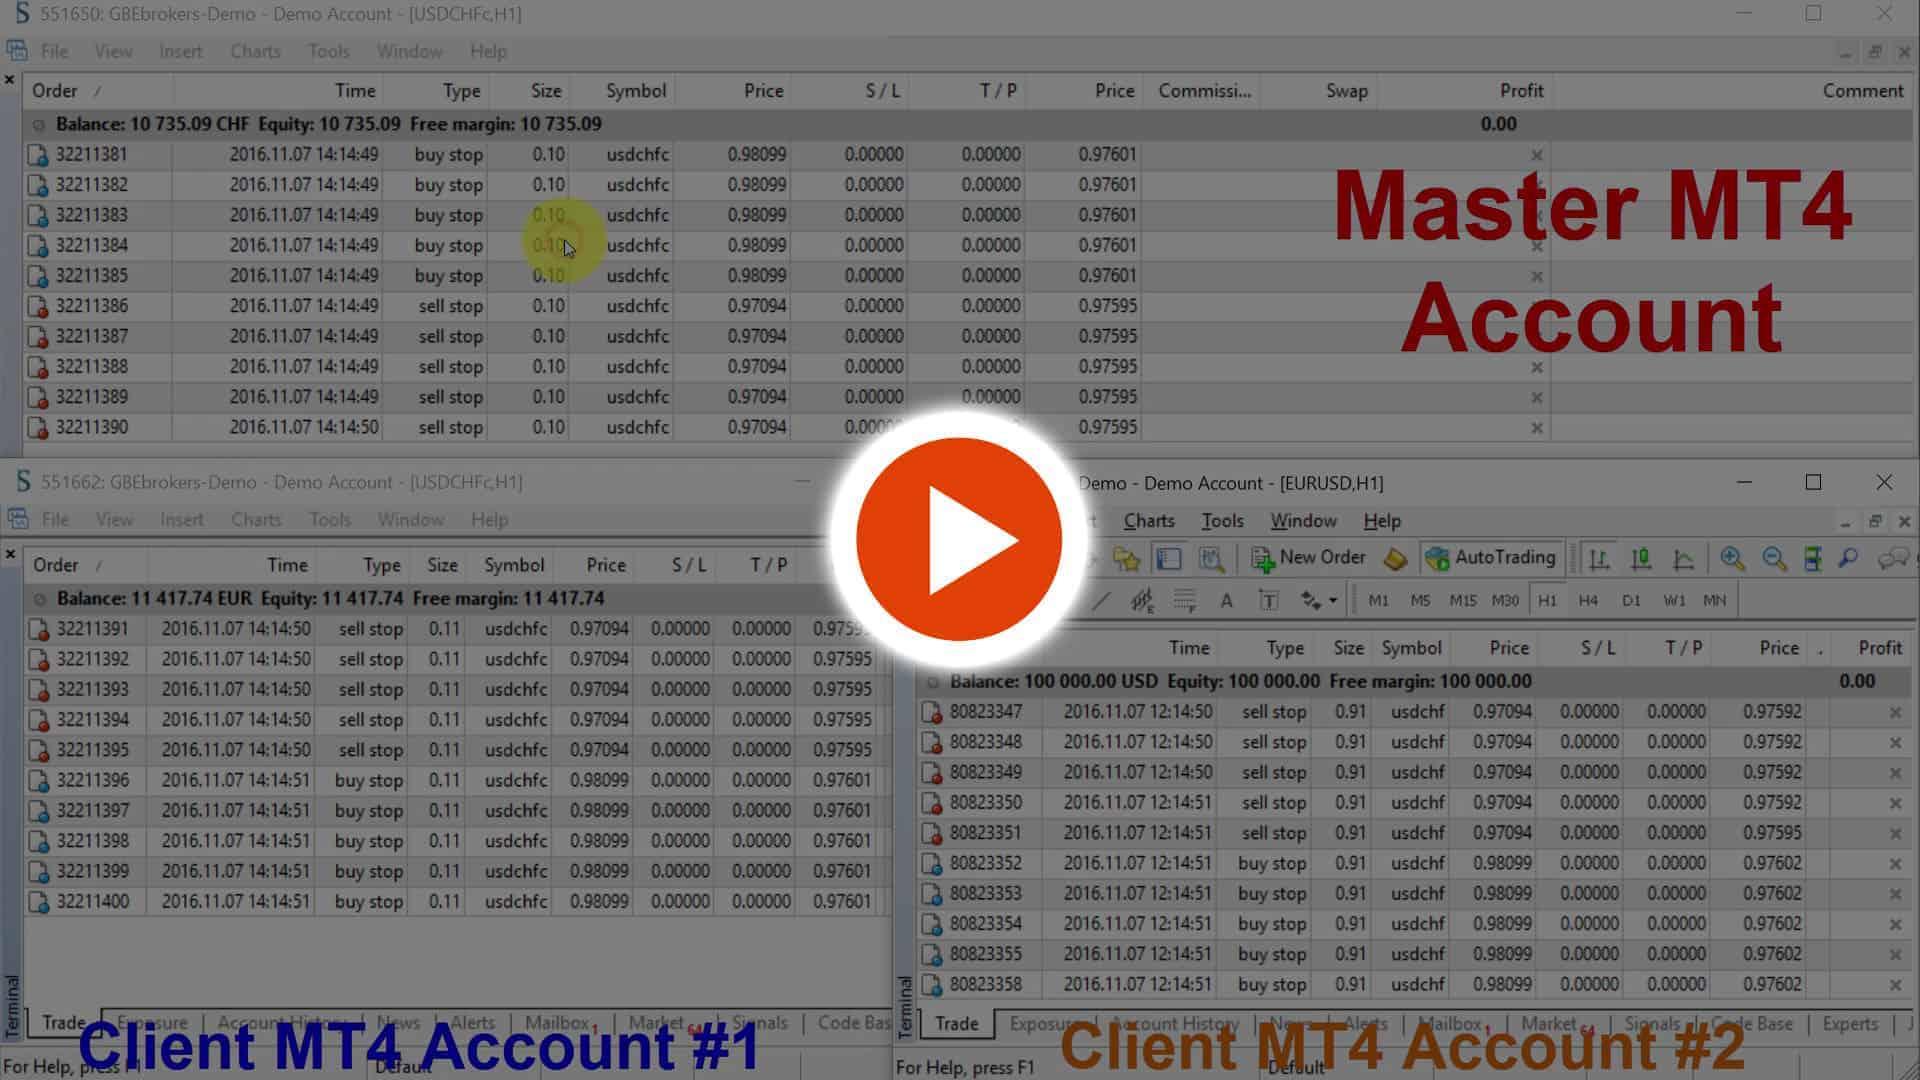 Fast Trade Copier on MetaTrader 4 (10 orders in 1 second)